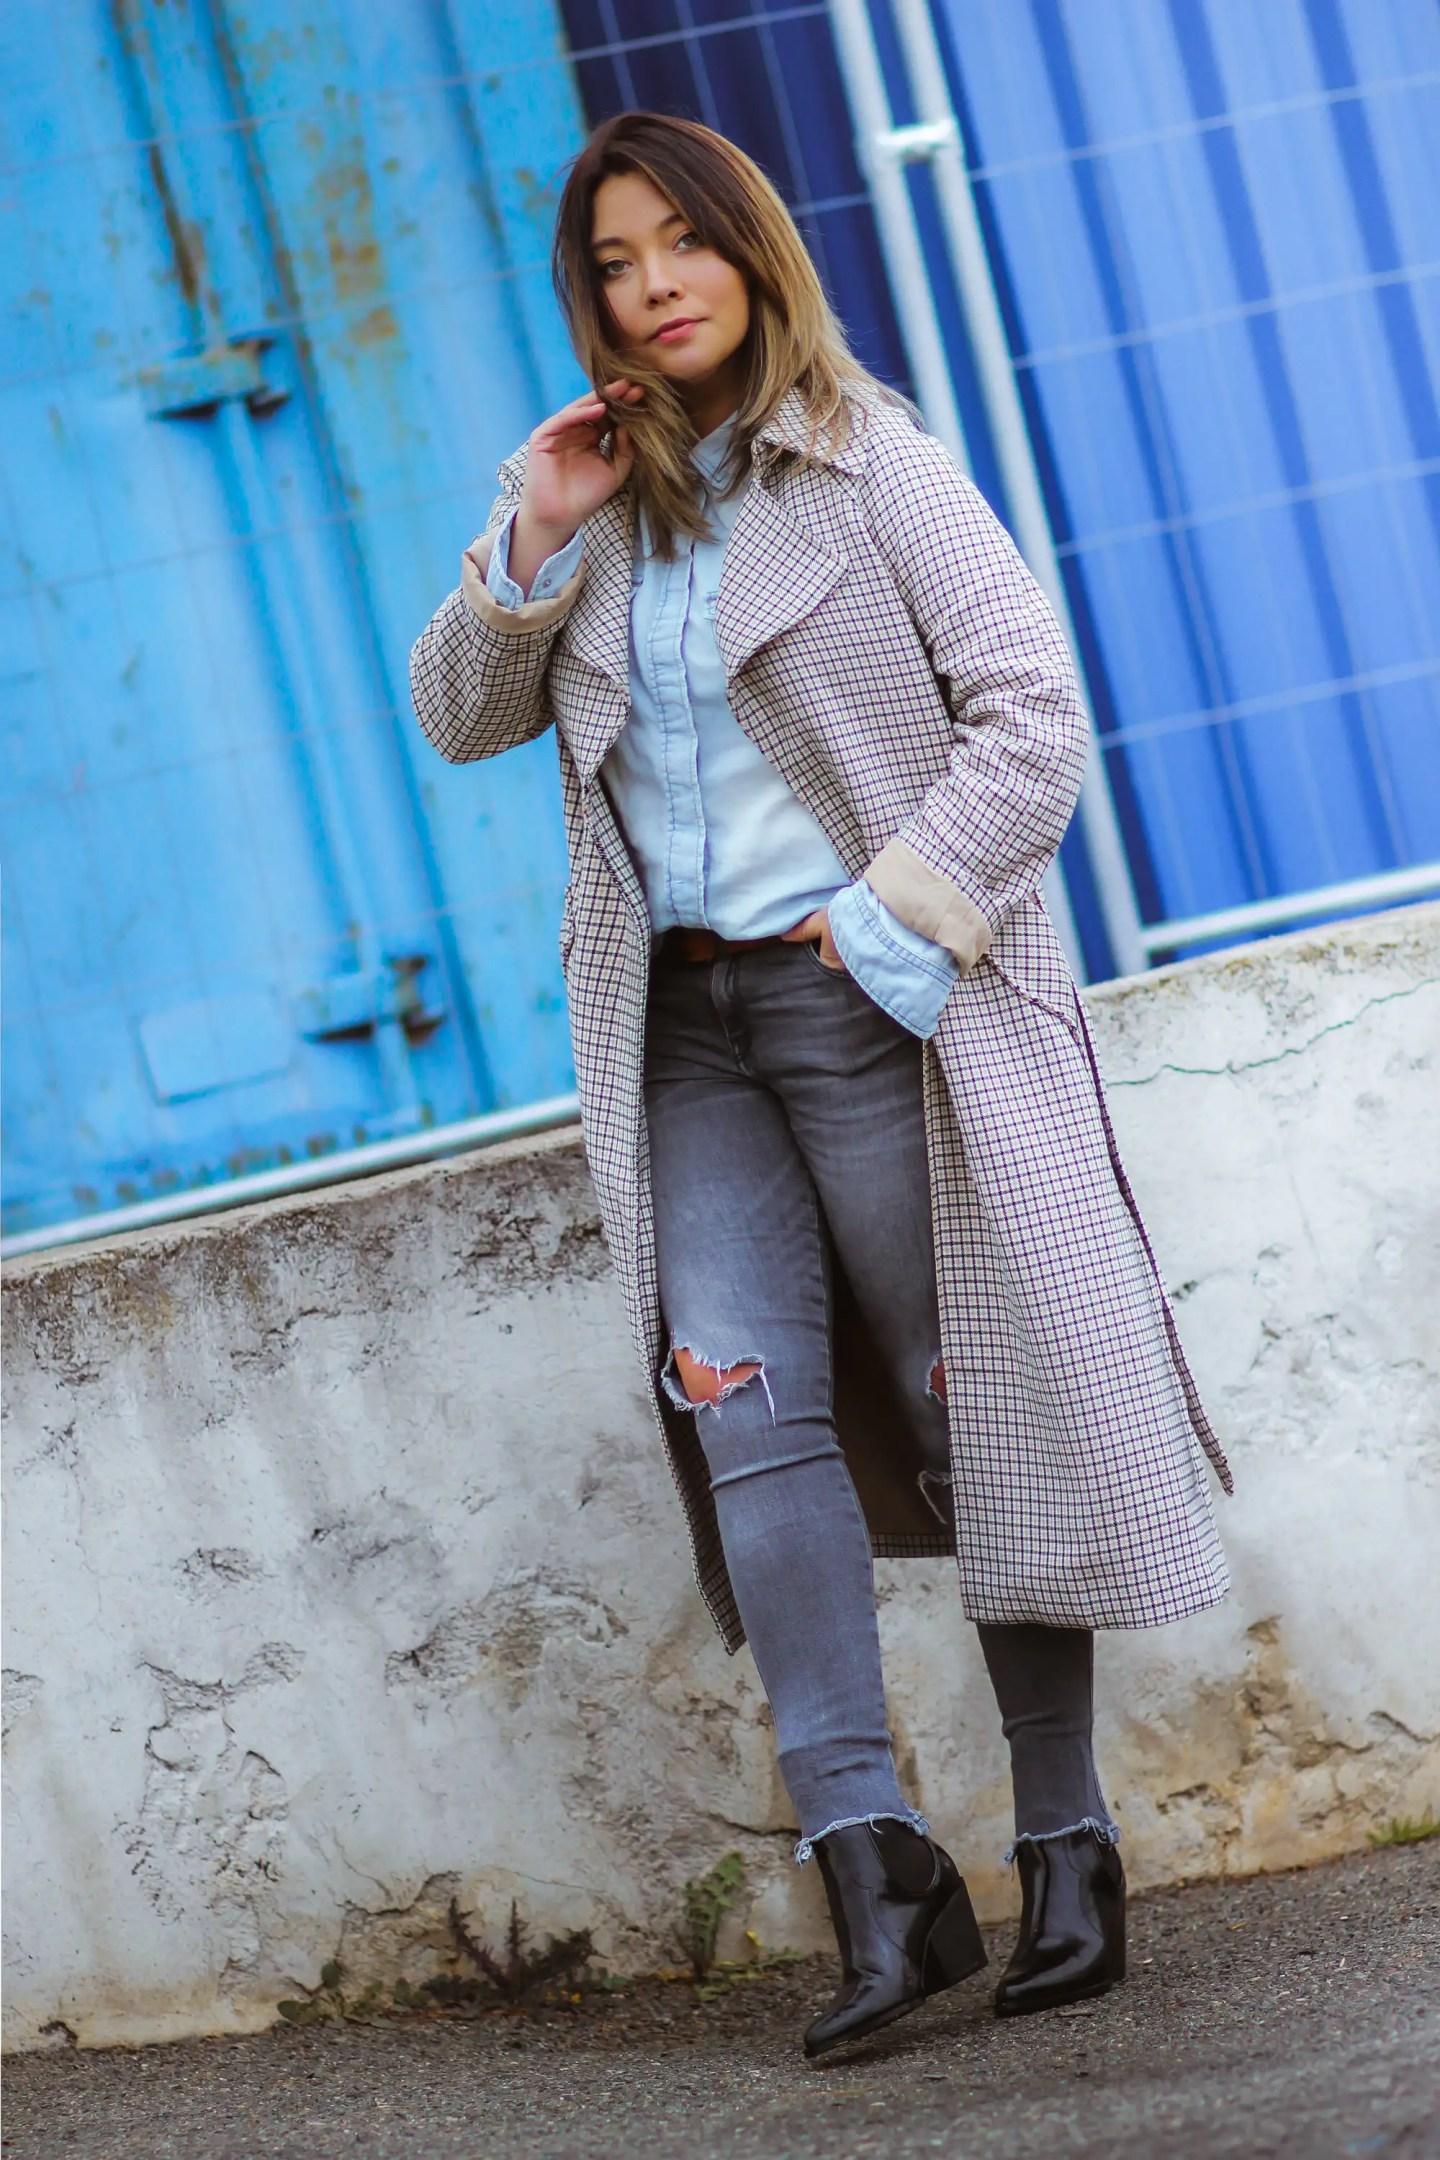 denim look & trench a carreaux, blog mode, blogueuse mode, trench carreaux femme, trench femme, tendances mode, the green ananas, pinterest mode, sac sceau, tendance jean, jeans, boots santiags, zara, h&m